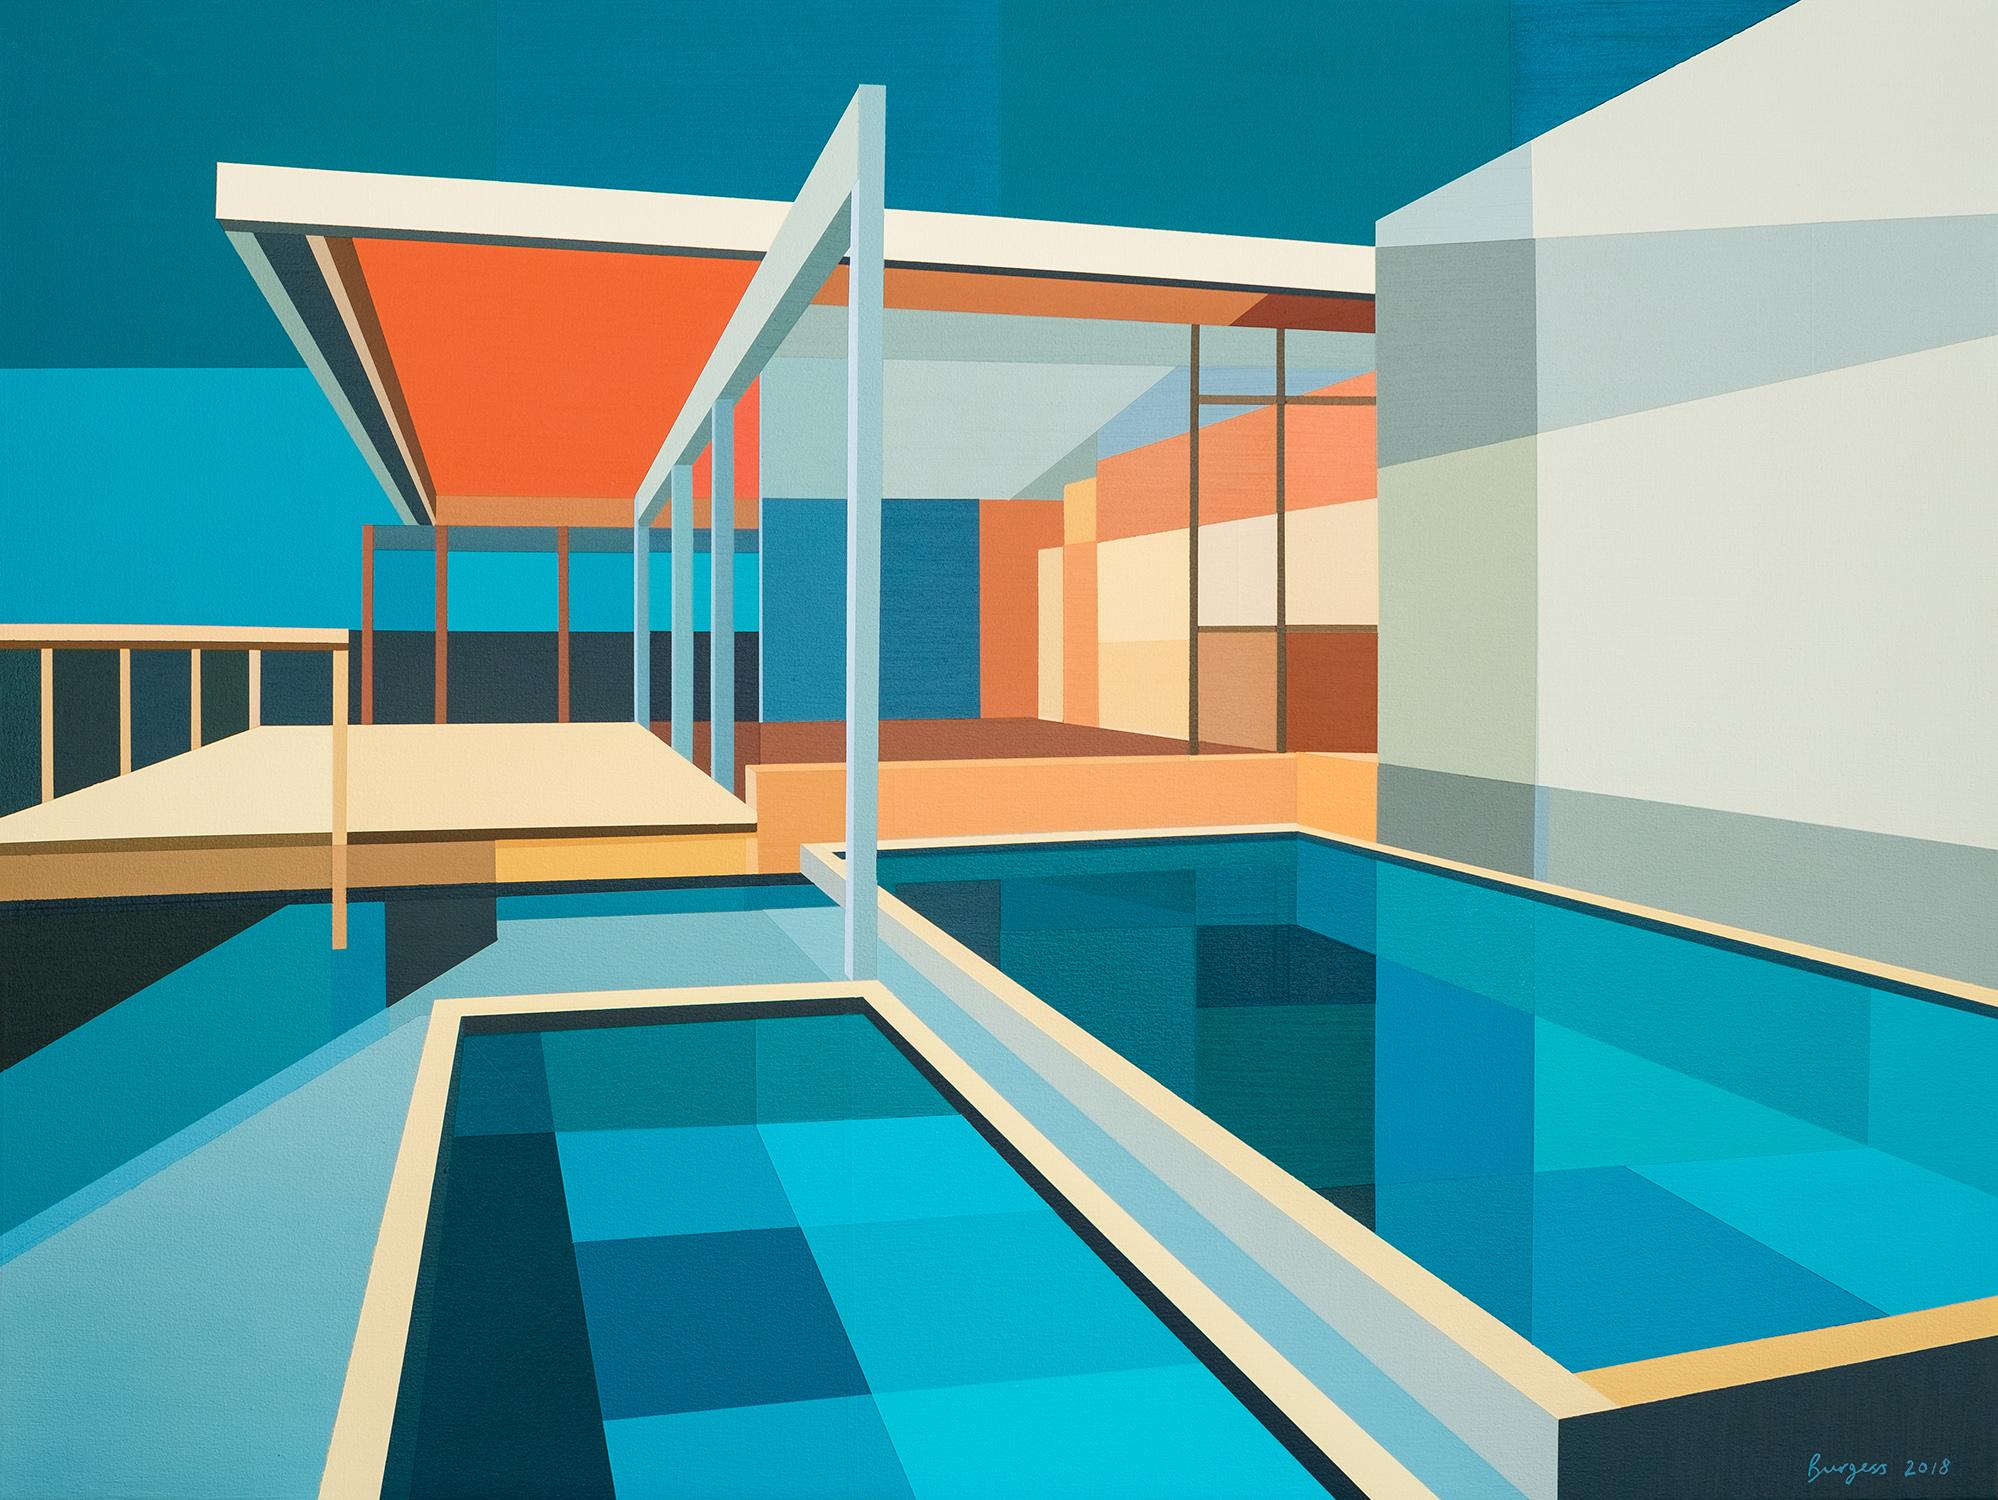 Burgess Re-Imagined Neutra II - Chuey House (2018) web.jpg